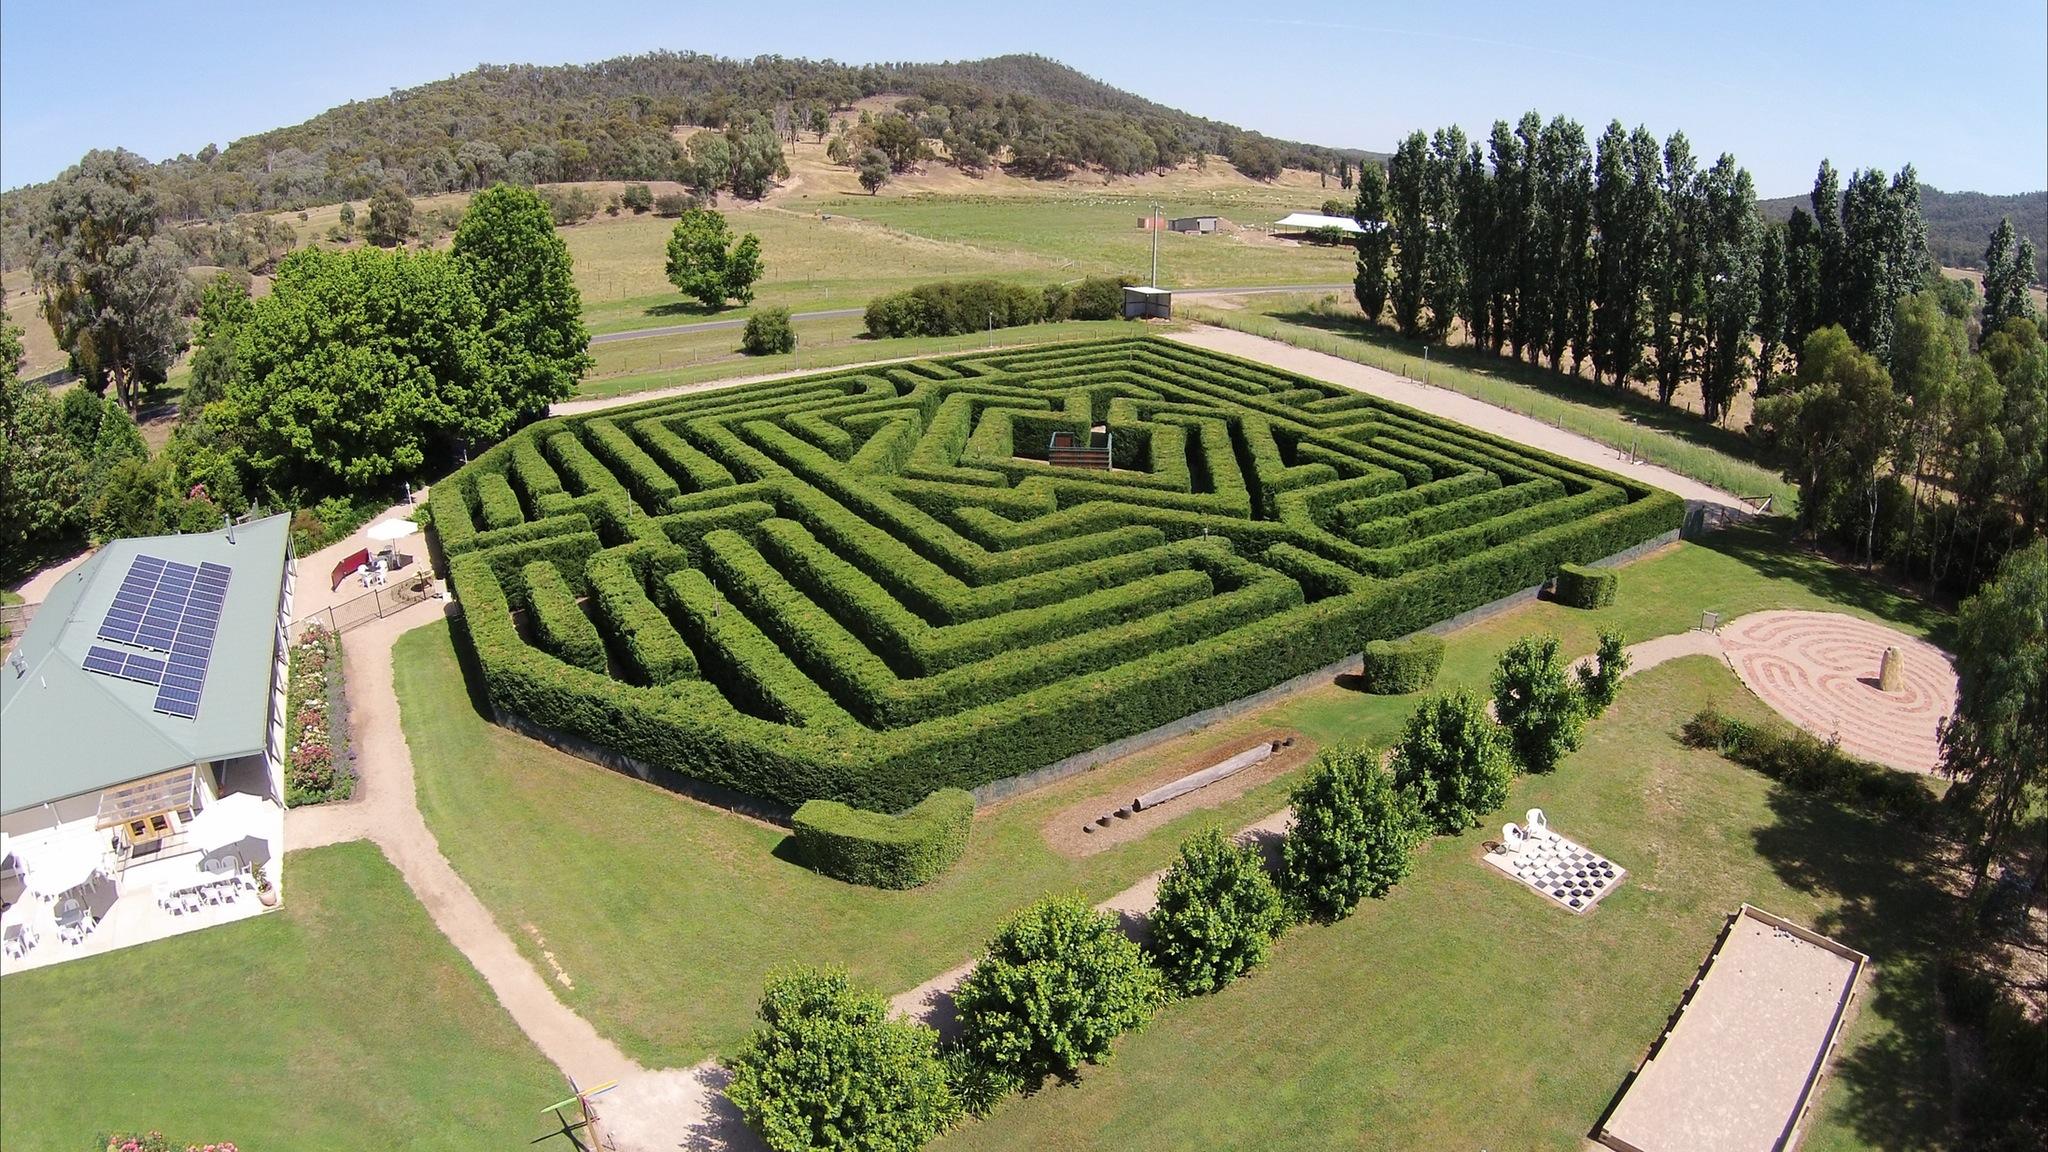 Airiel photo of maze